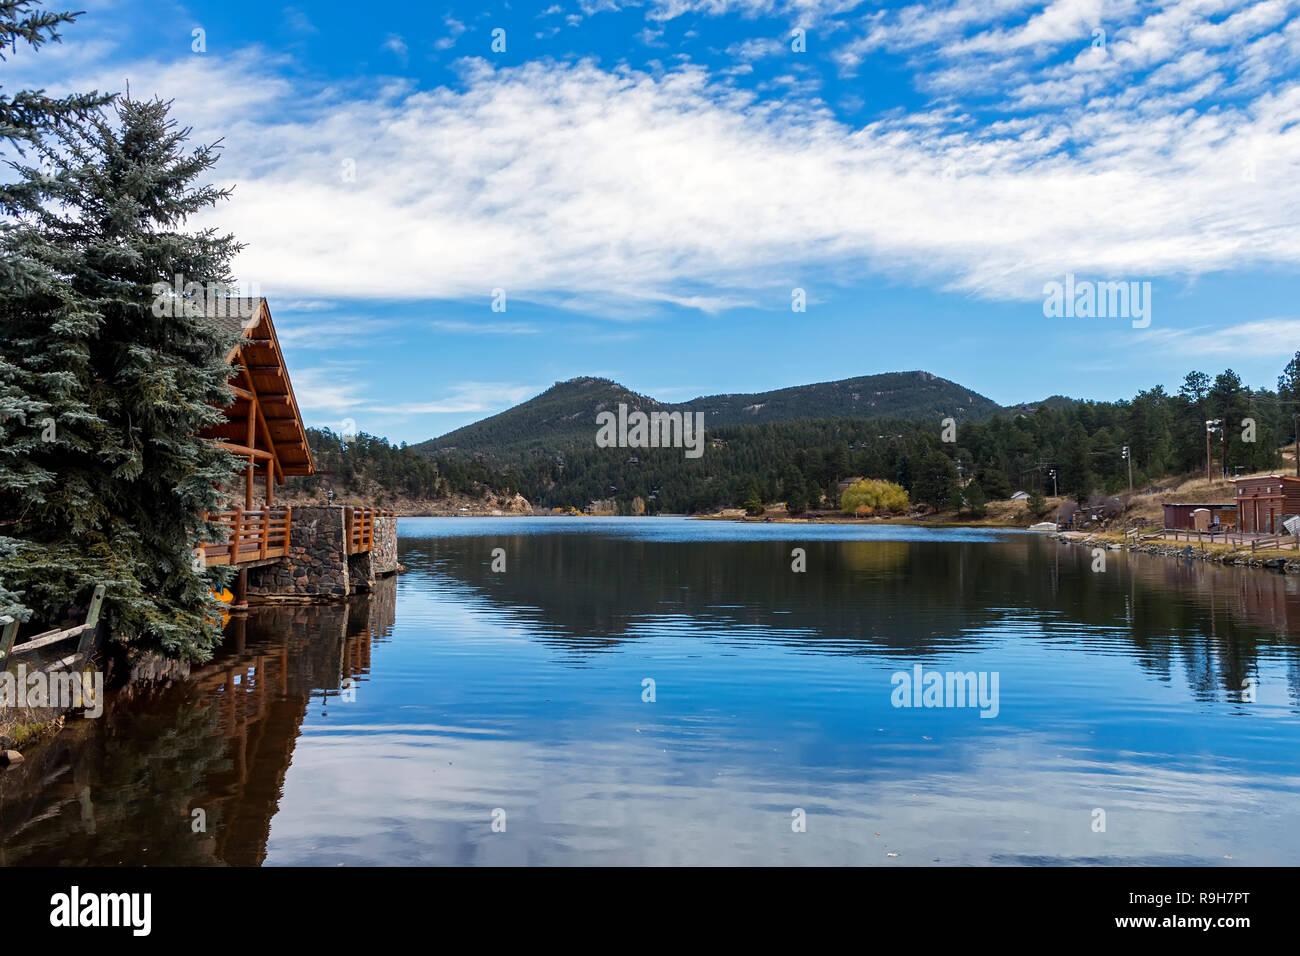 Landscape in Colorado. - Stock Image